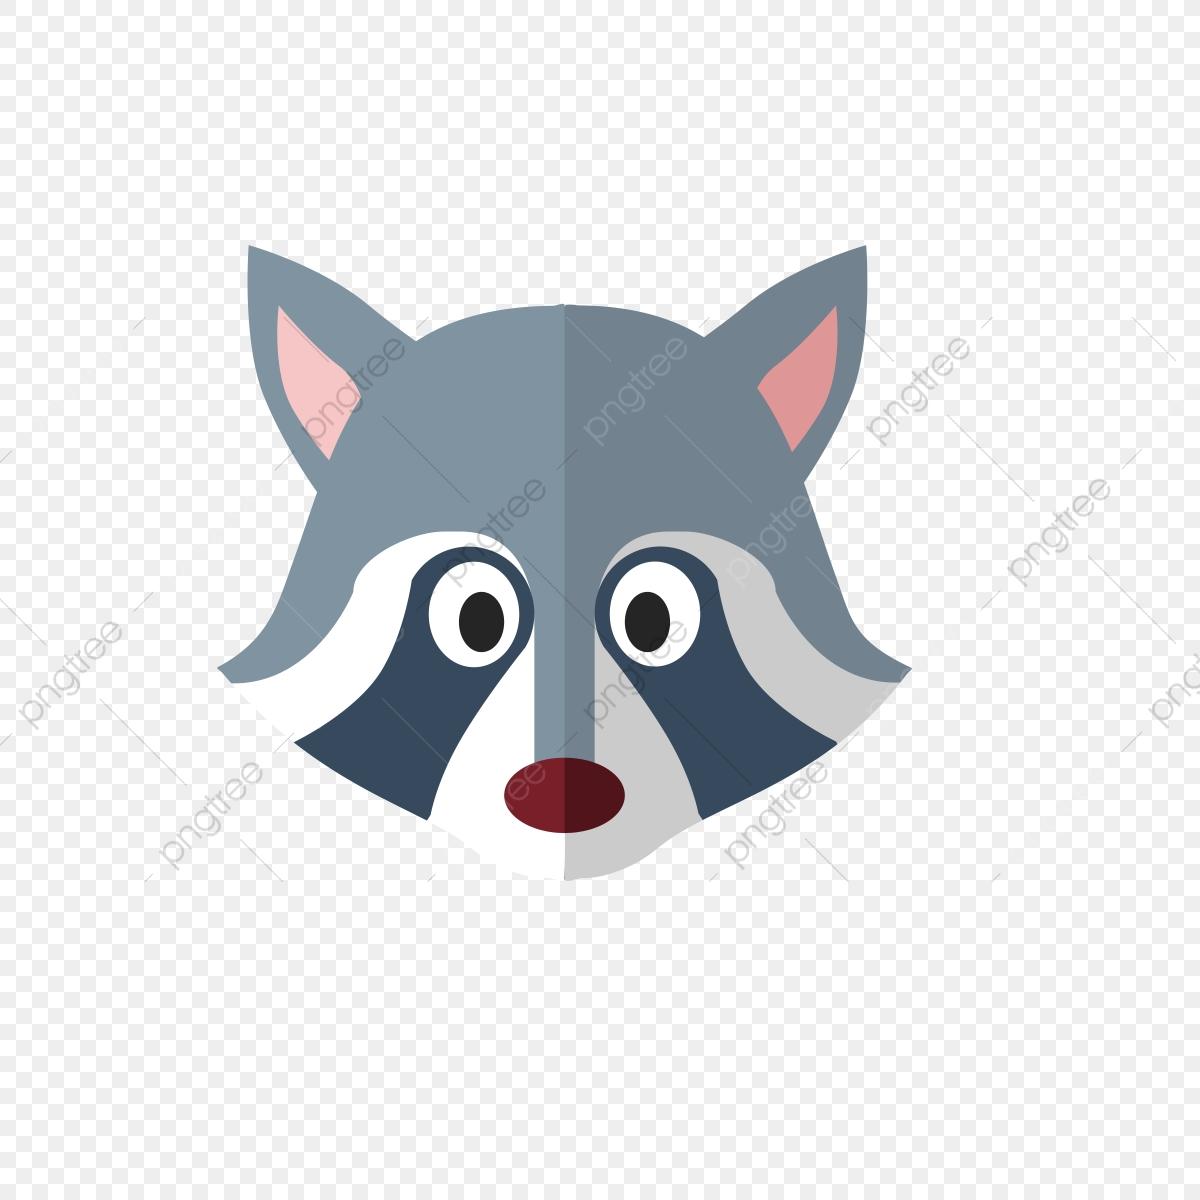 Raccoon Clipart Icon, Icon, Social Media Icons, Camera Icons.